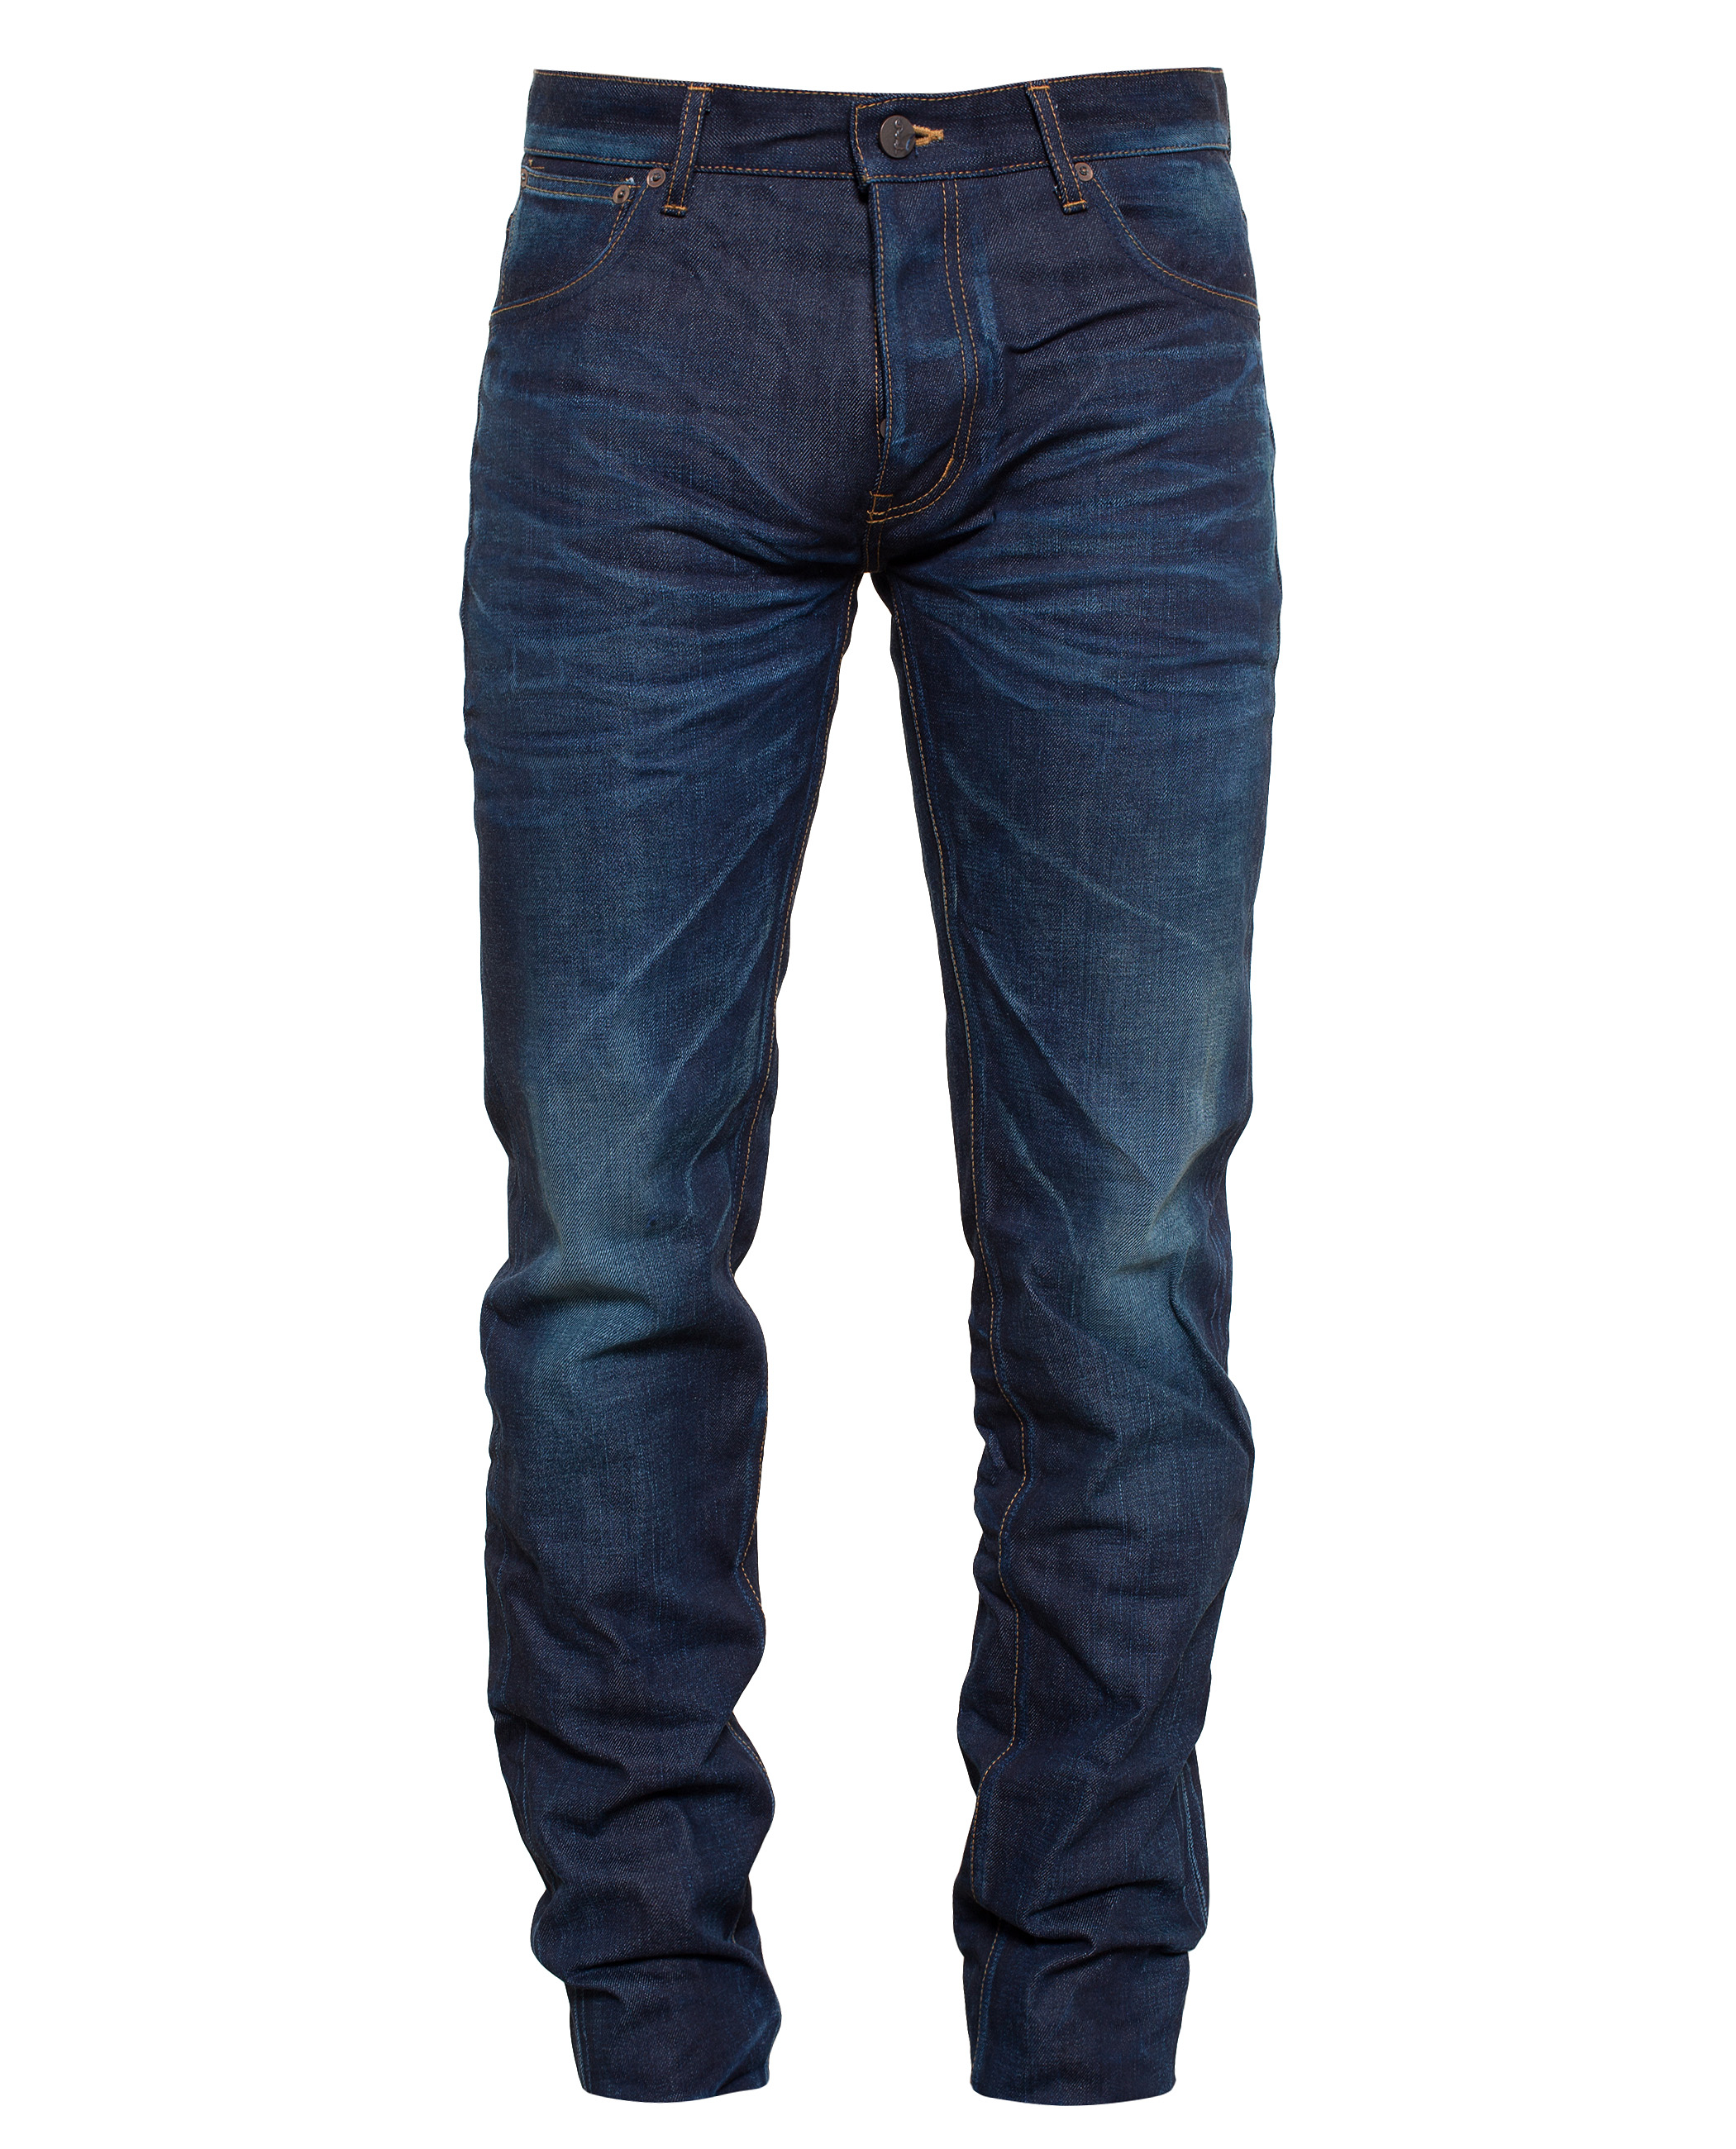 Snake and Dagger Denim Pacer Jeans in Natural  Indigo  Denim (Blue) for Men